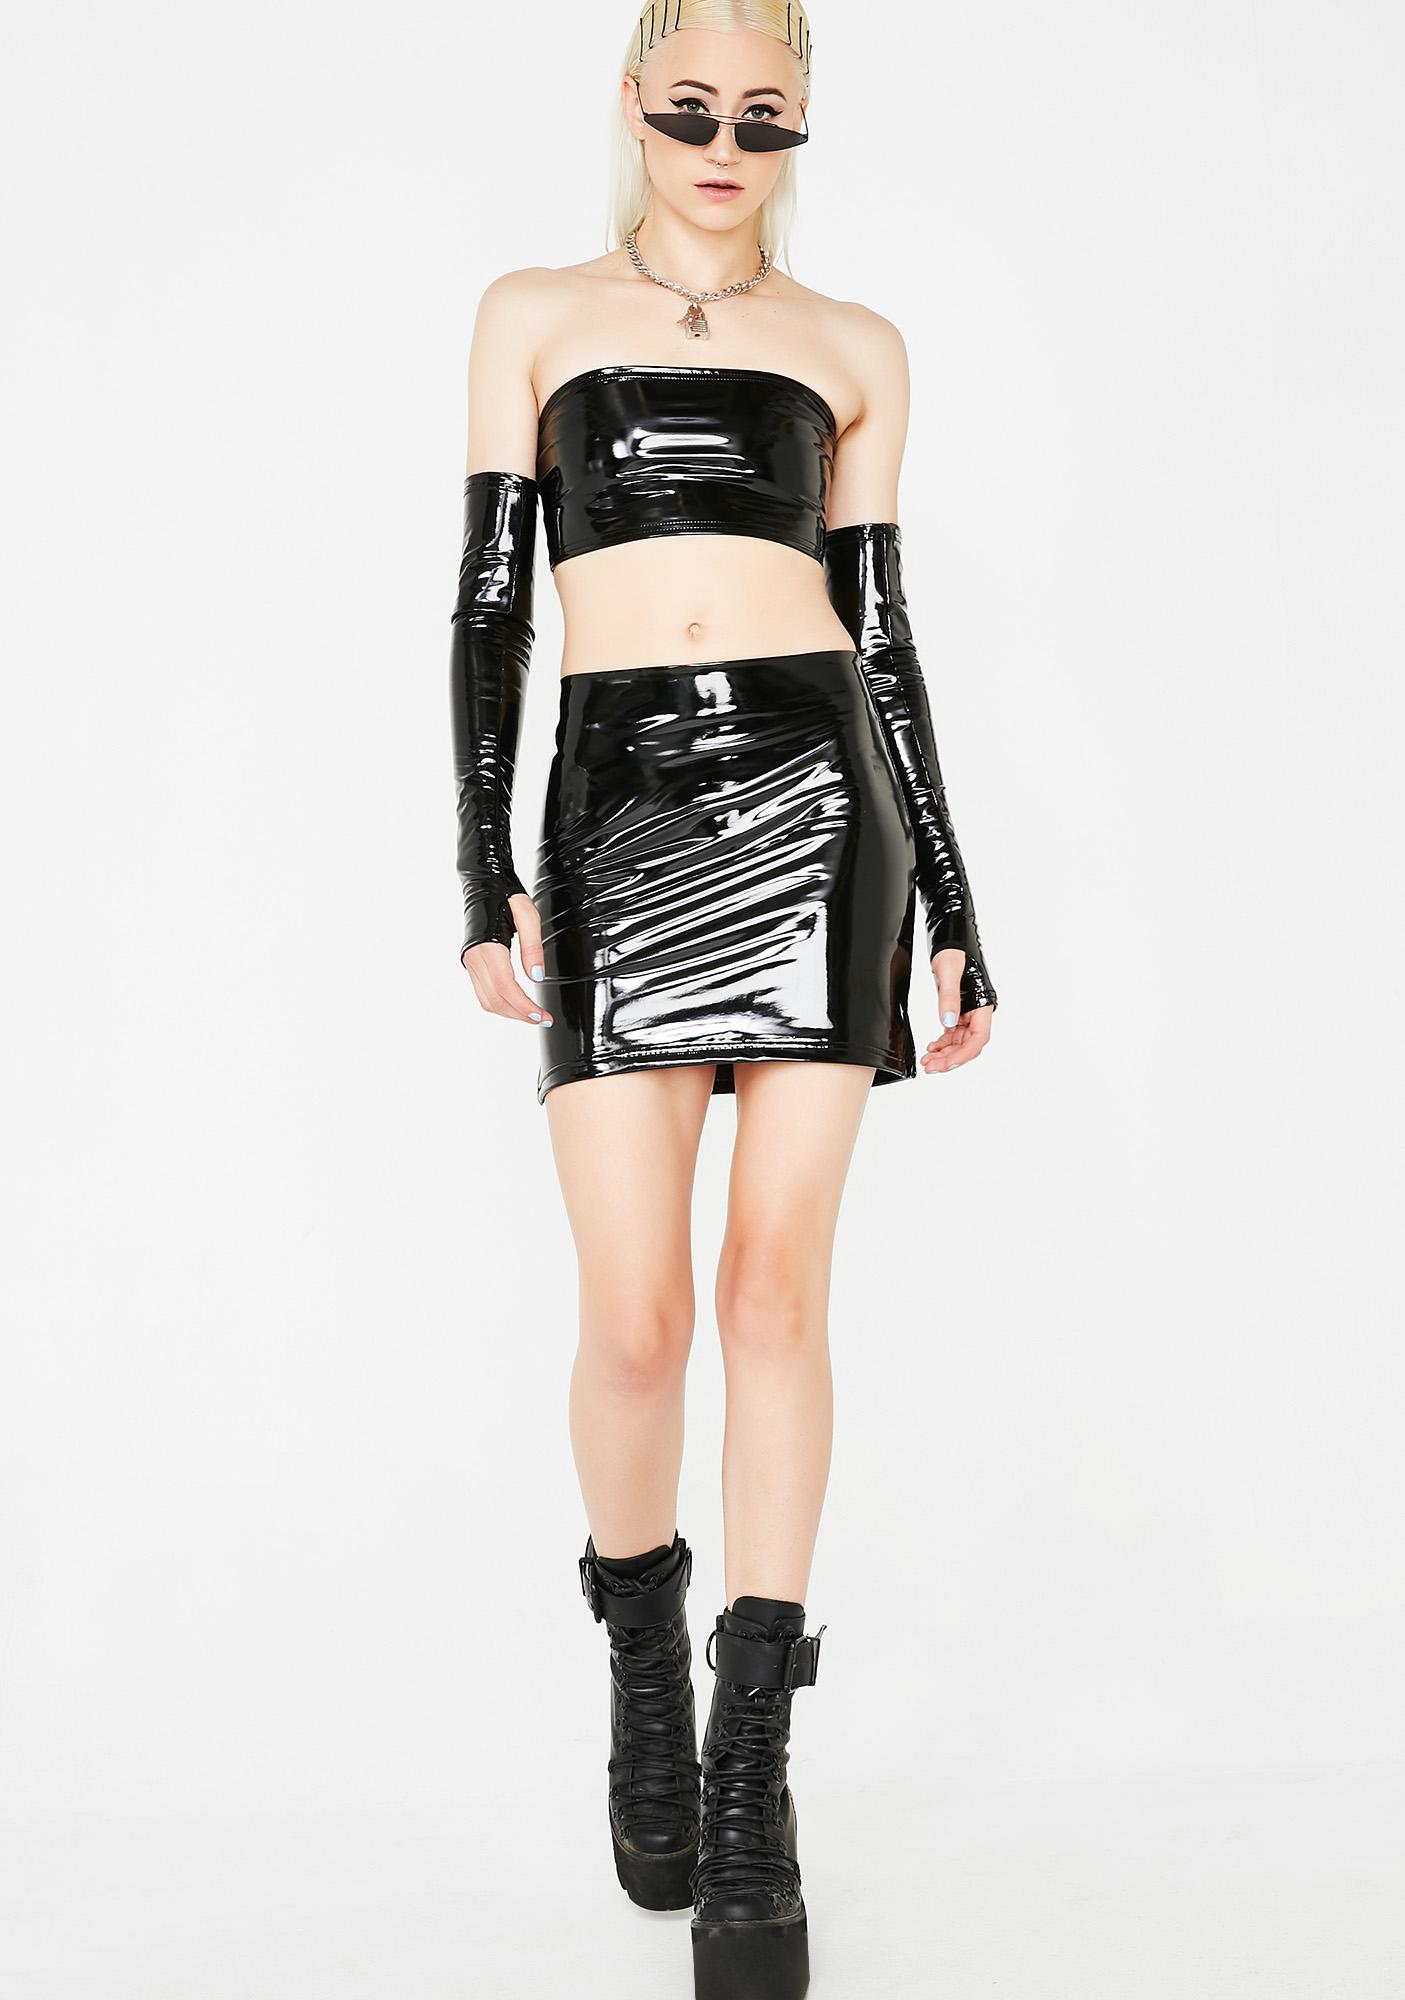 Current Mood Lethal Kiss Vinyl Mini Skirt